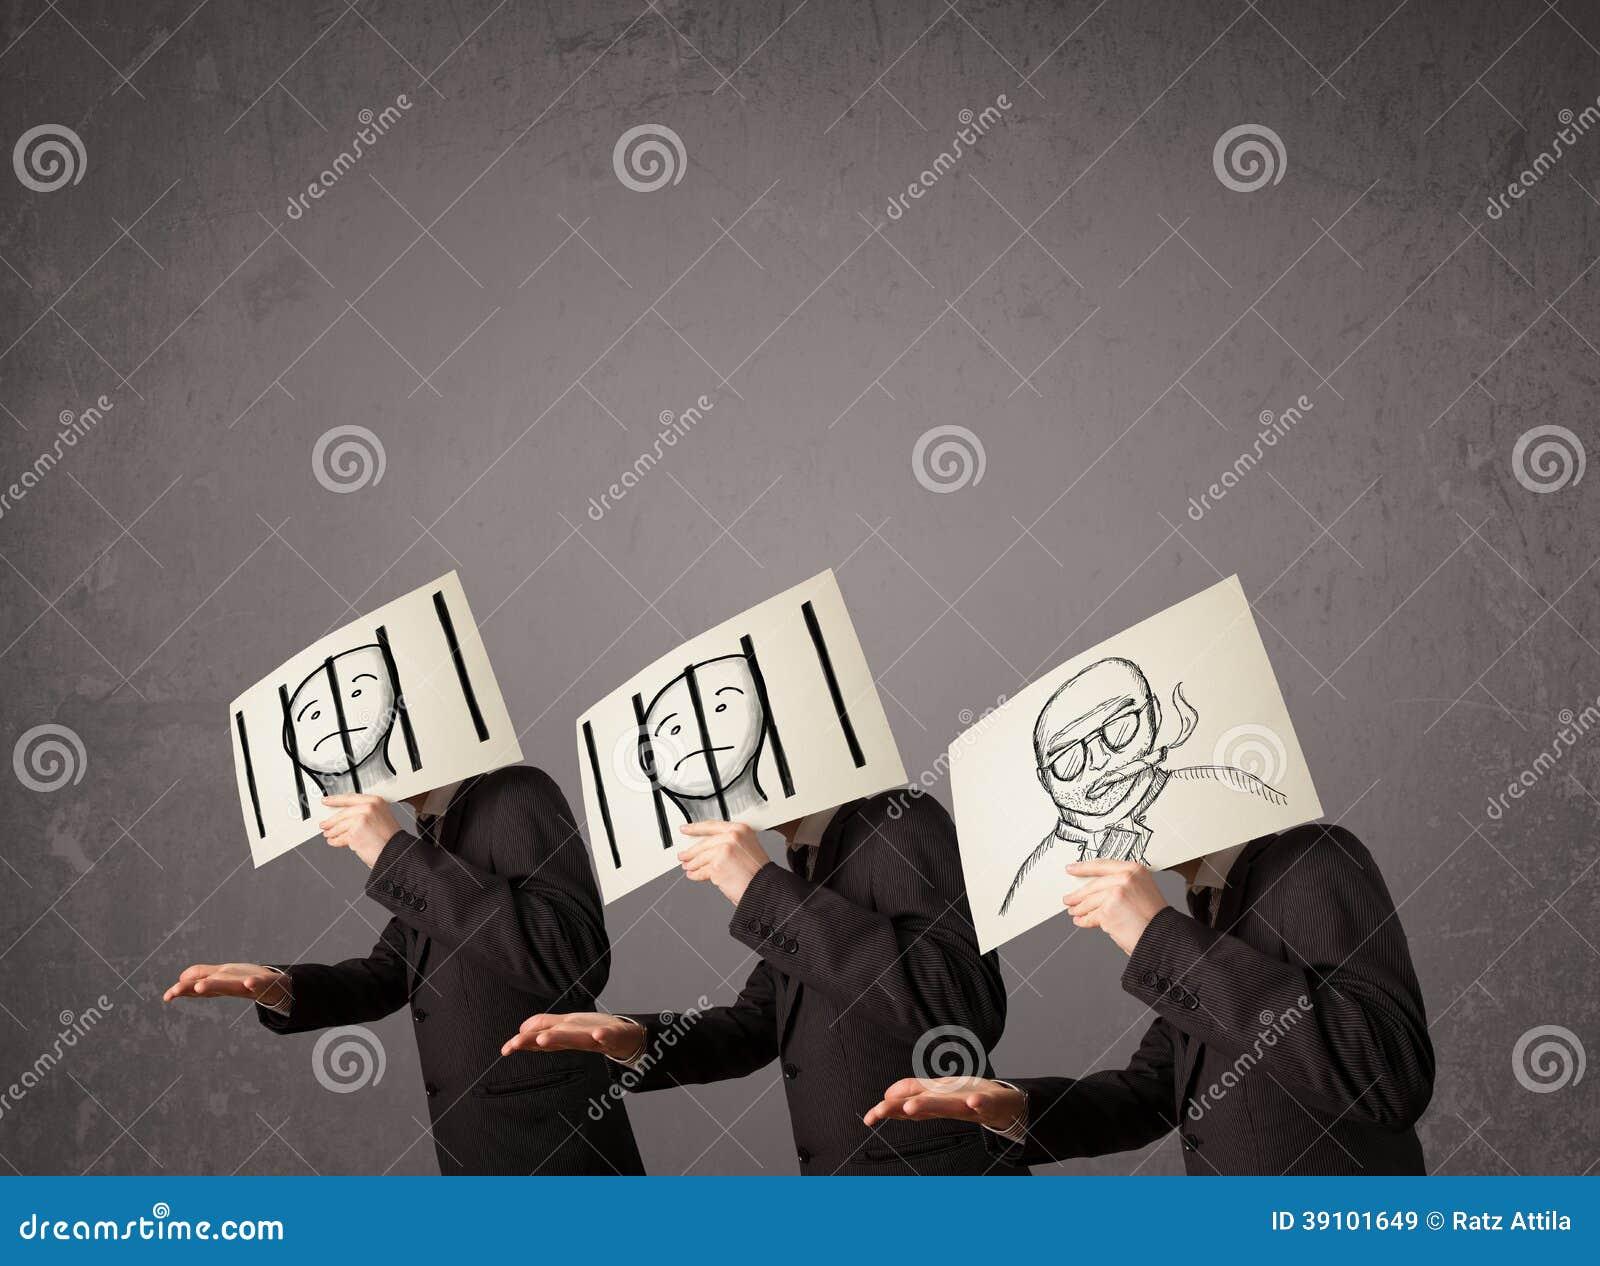 Mensen in het formele gesturing met karton